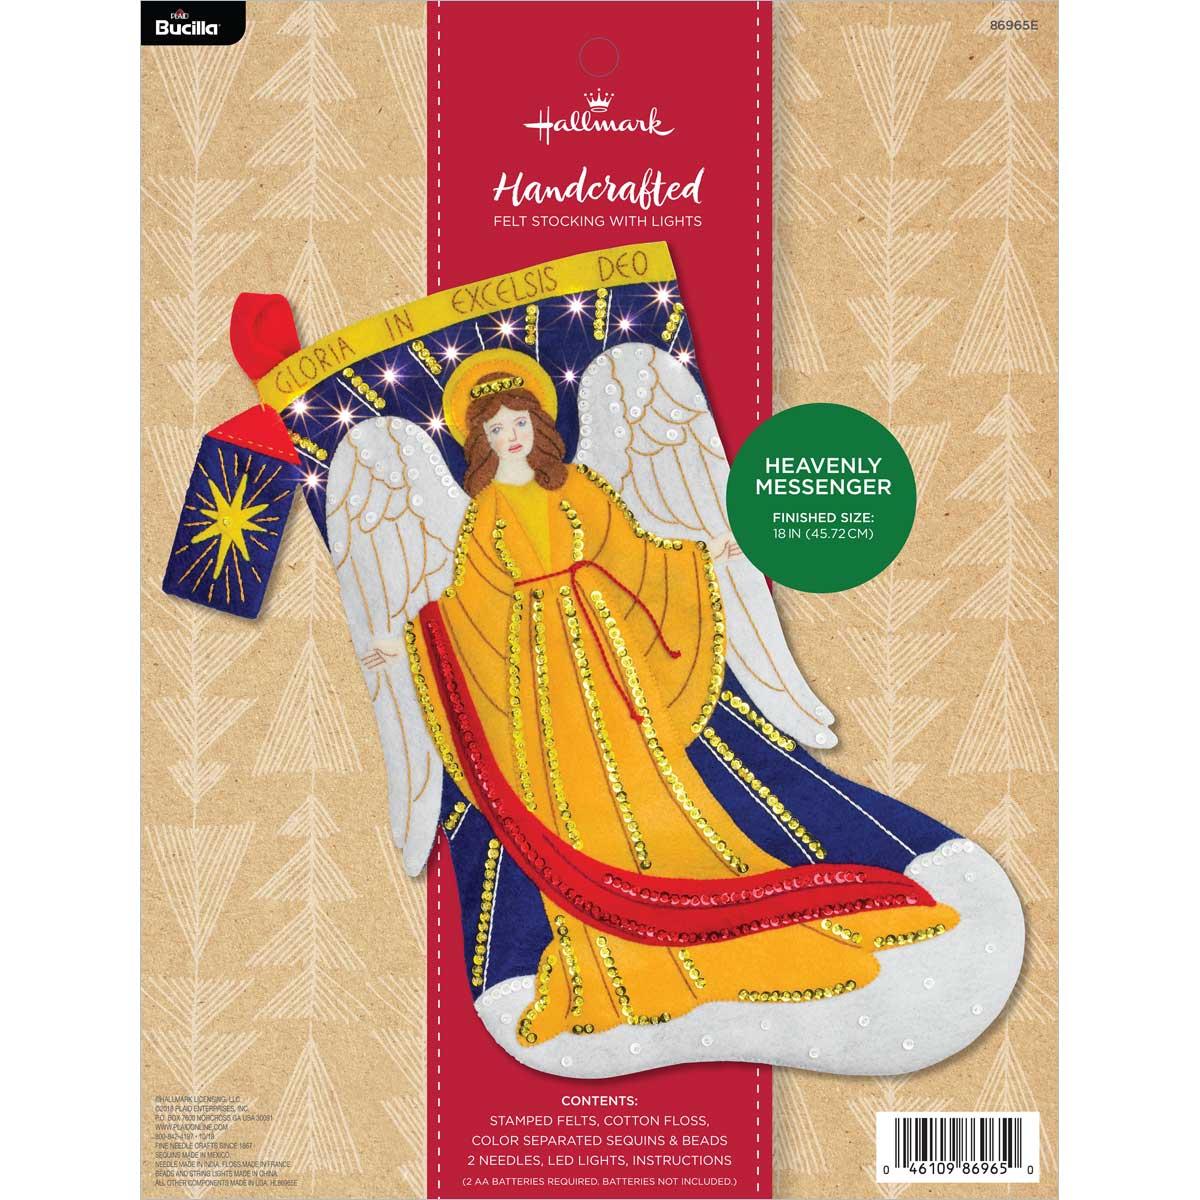 Bucilla ® Seasonal - Felt - Stocking Kits - Hallmark - Heavenly Messenger with Lights - 86965E